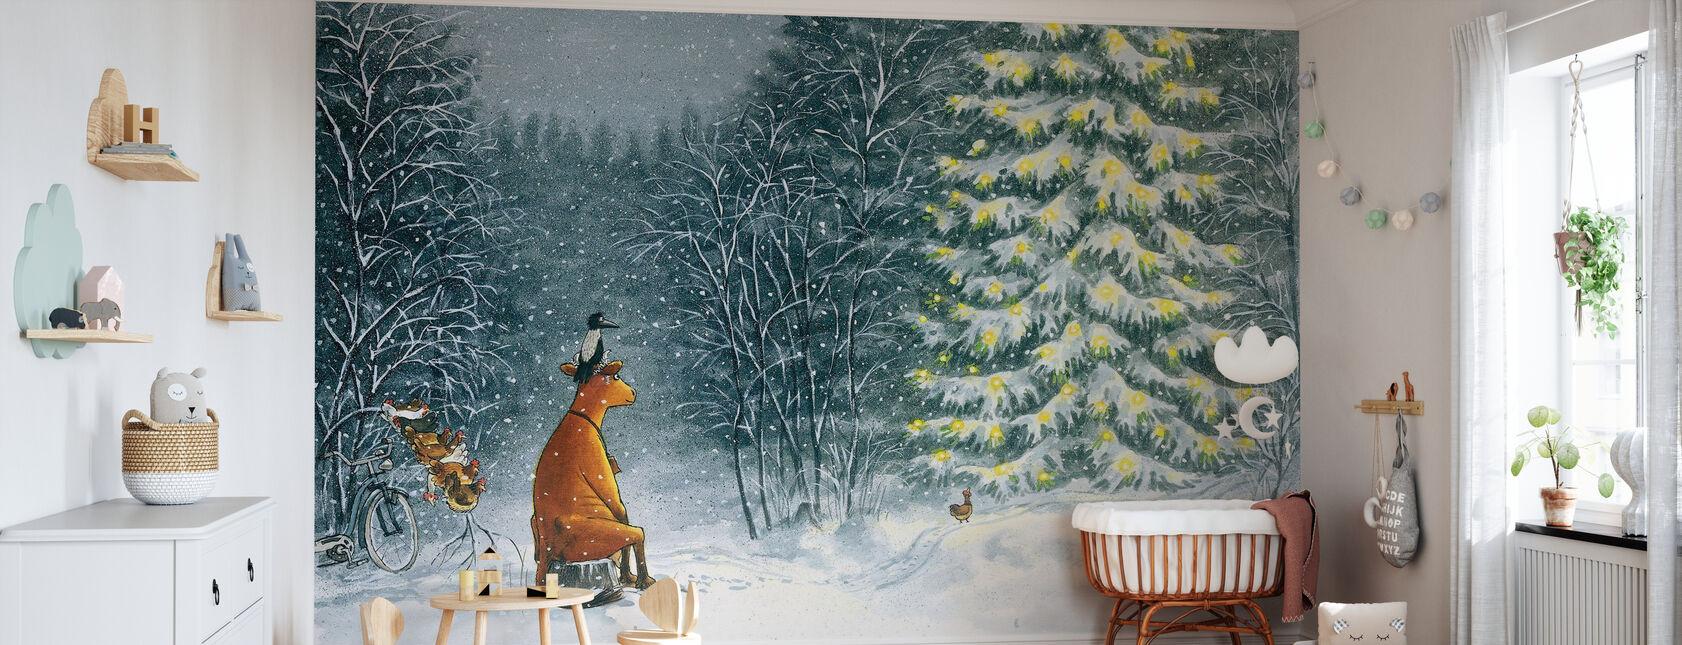 Mamma Mu & kråke - mamma Mu & kråke jul - Tapet - Babyrom